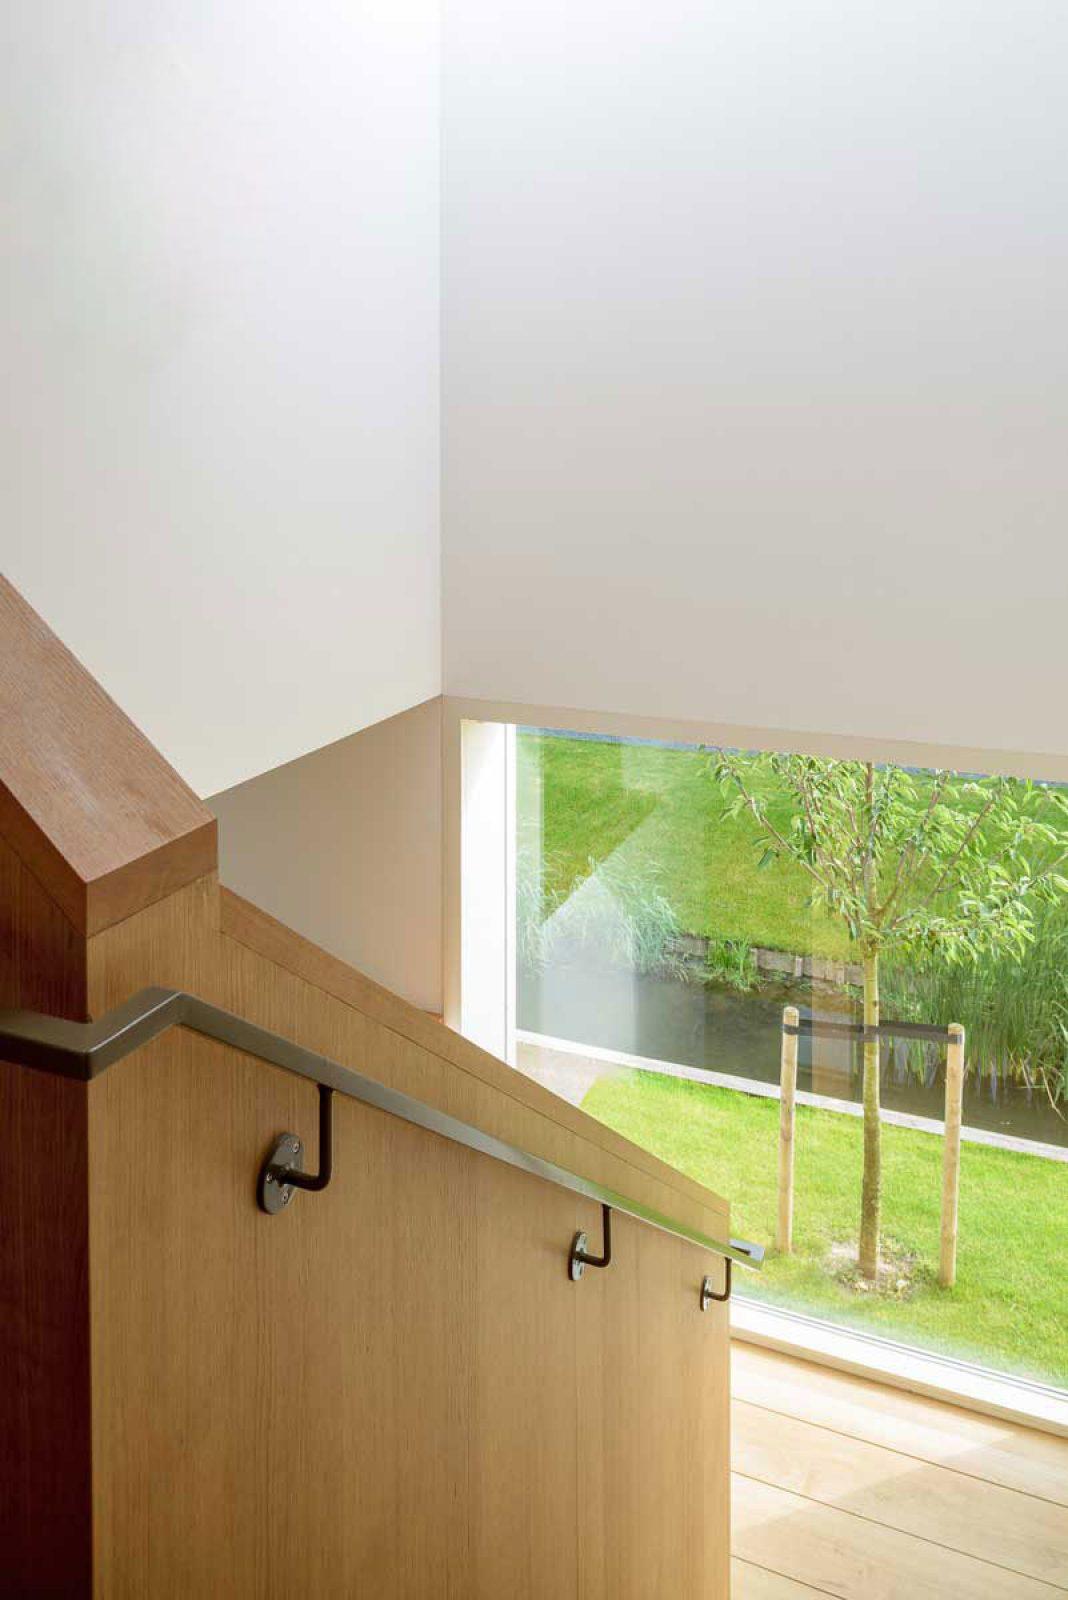 Nesselande Interior Stair Ballustrade